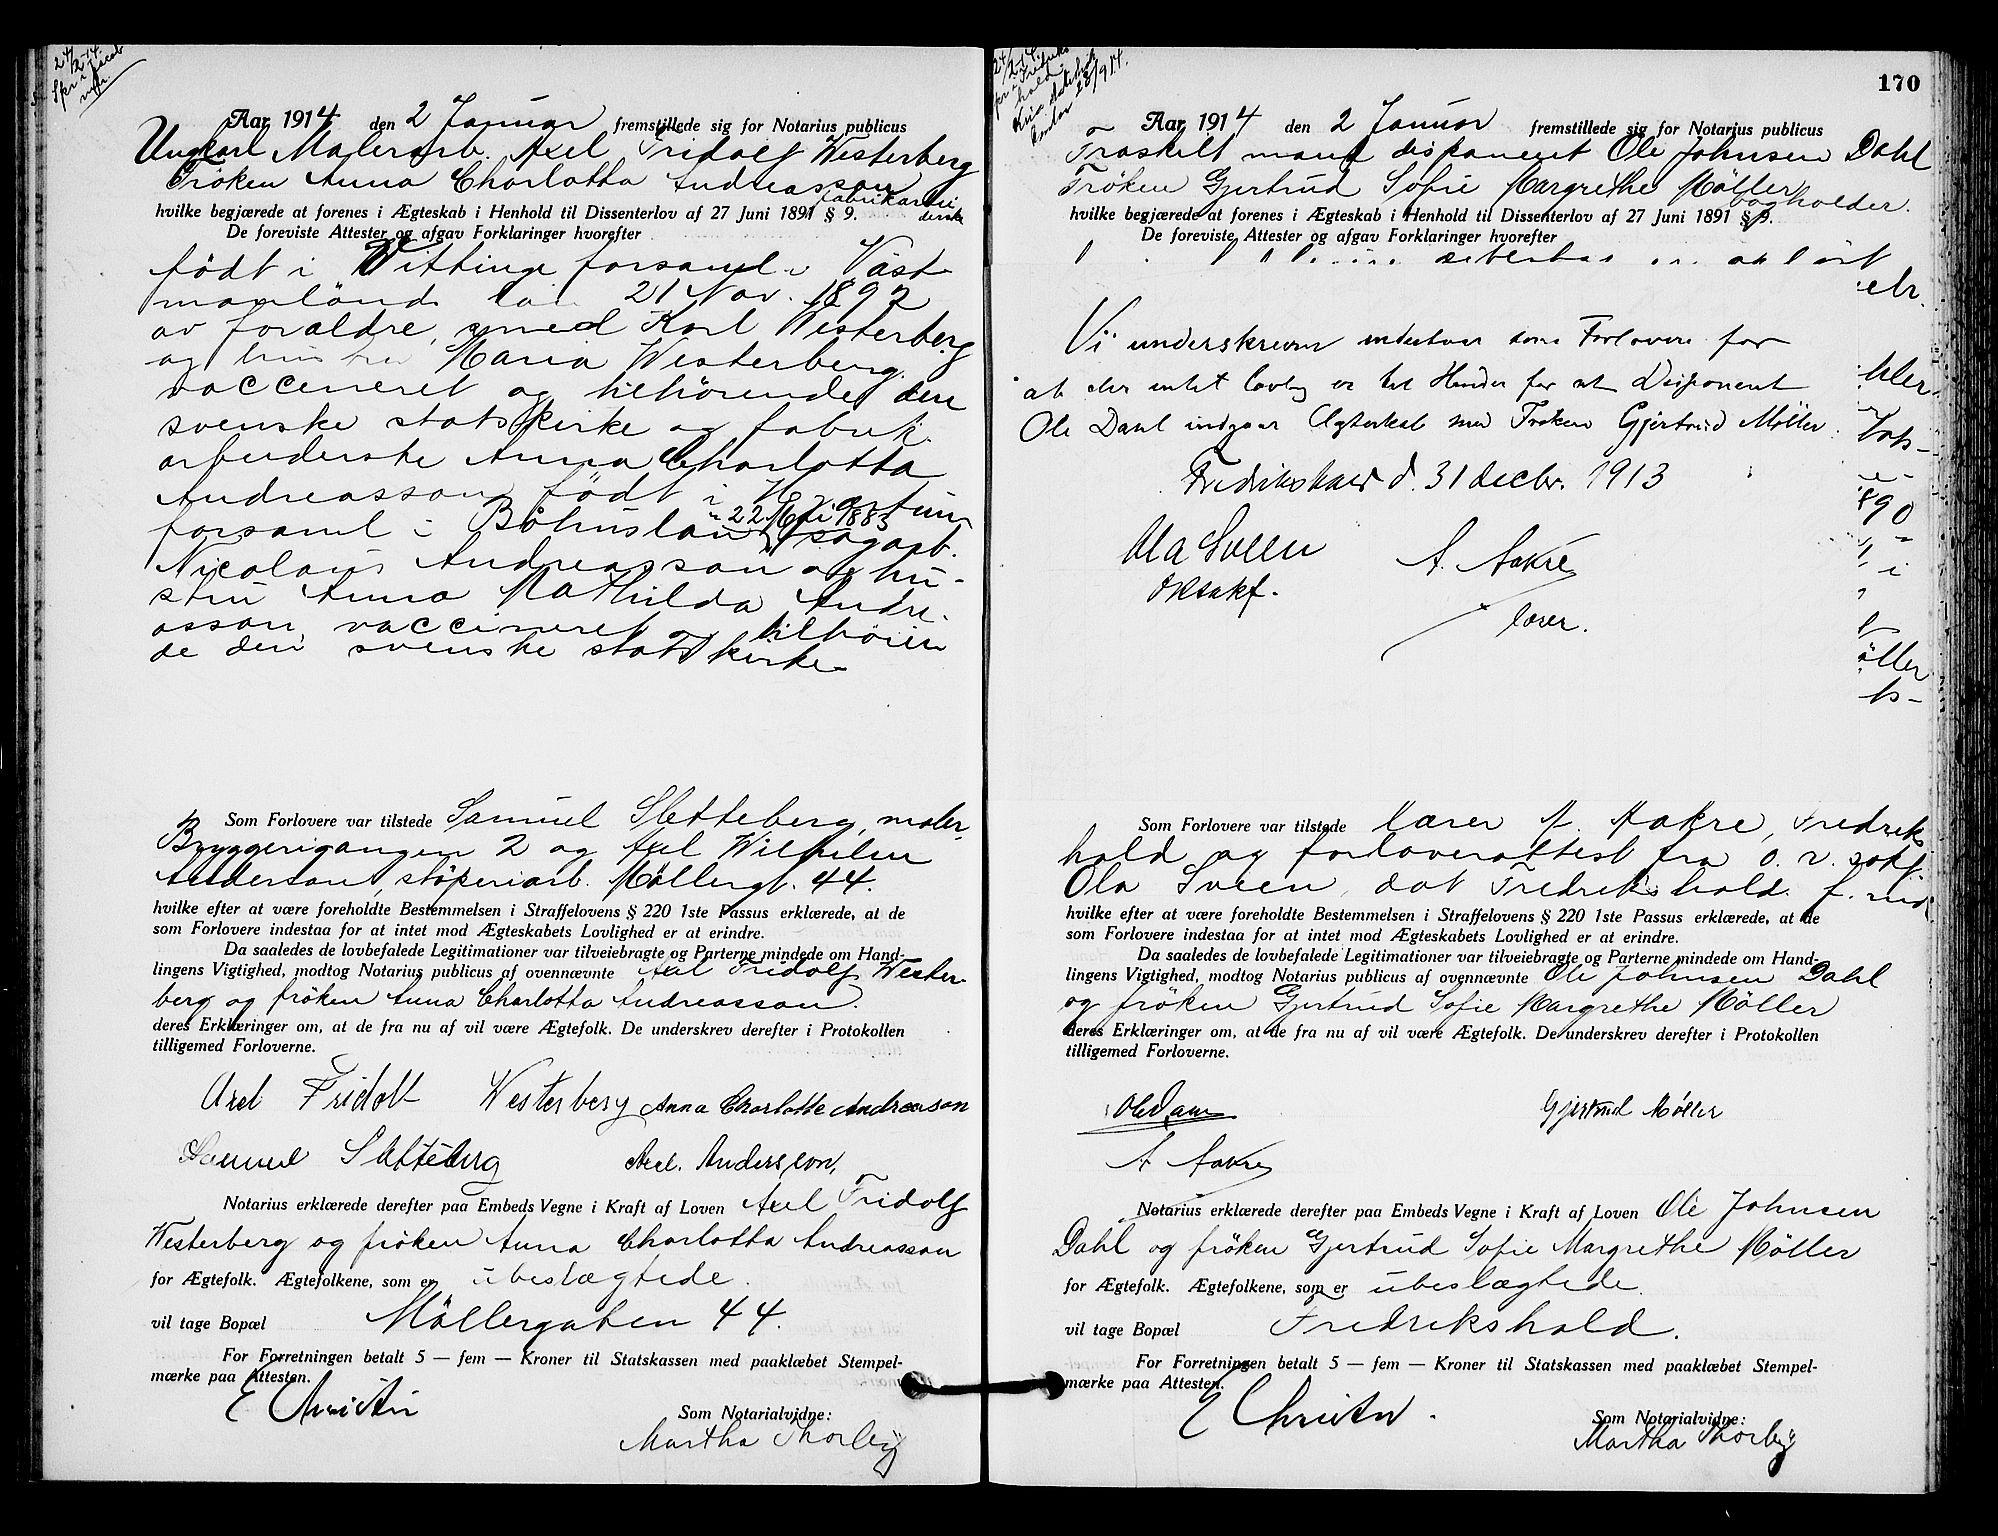 SAO, Oslo byfogd avd. I, L/Lb/Lbb/L0009: Notarialprotokoll, rekke II: Vigsler, 1913-1914, s. 169b-170a